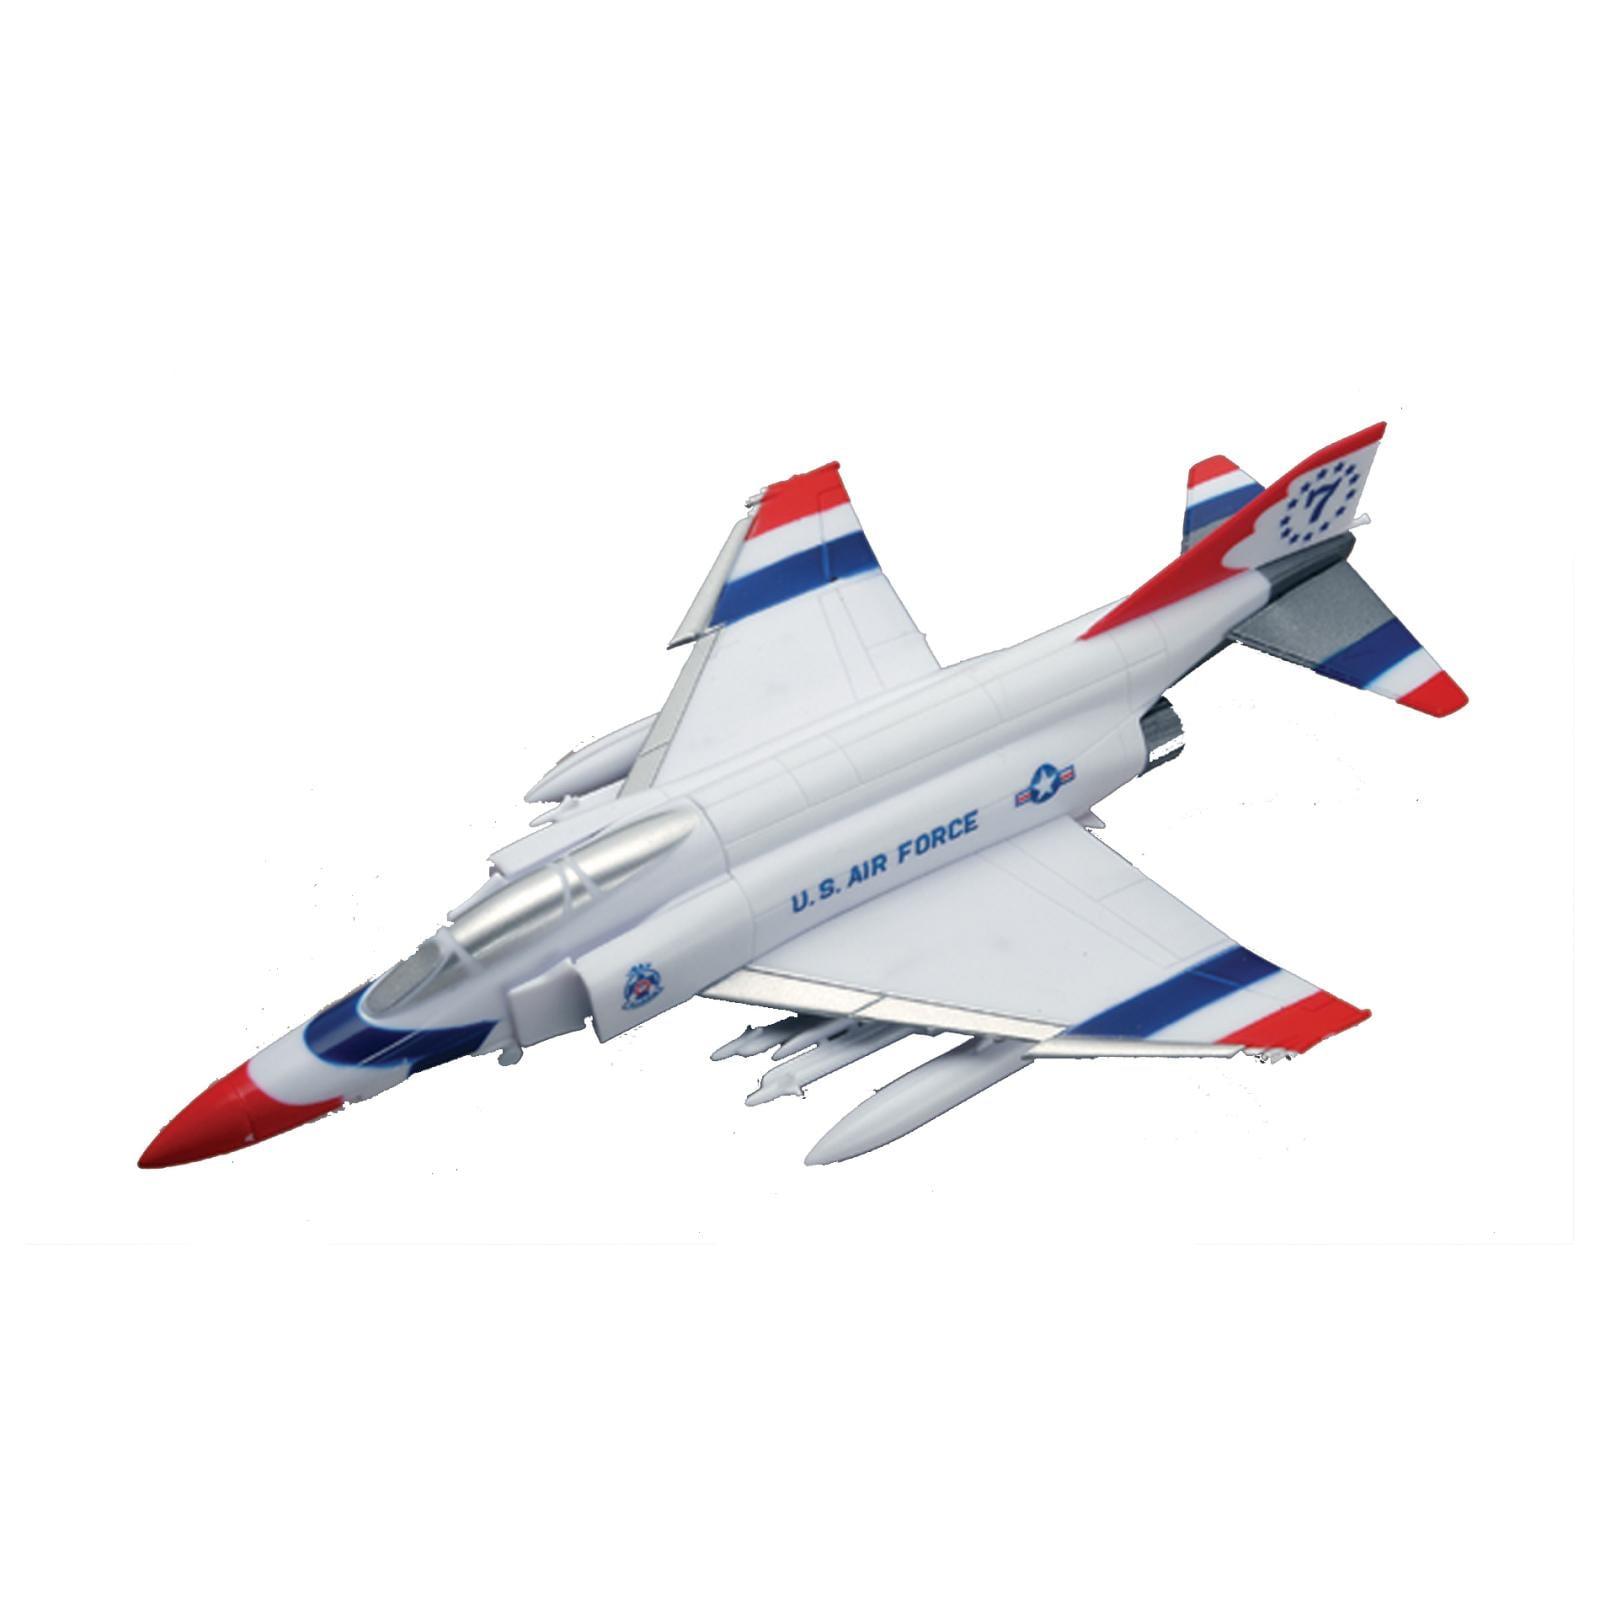 REVELL-MONOGRAM 1:100 Scale Phantom Thunderbird, Black (P...